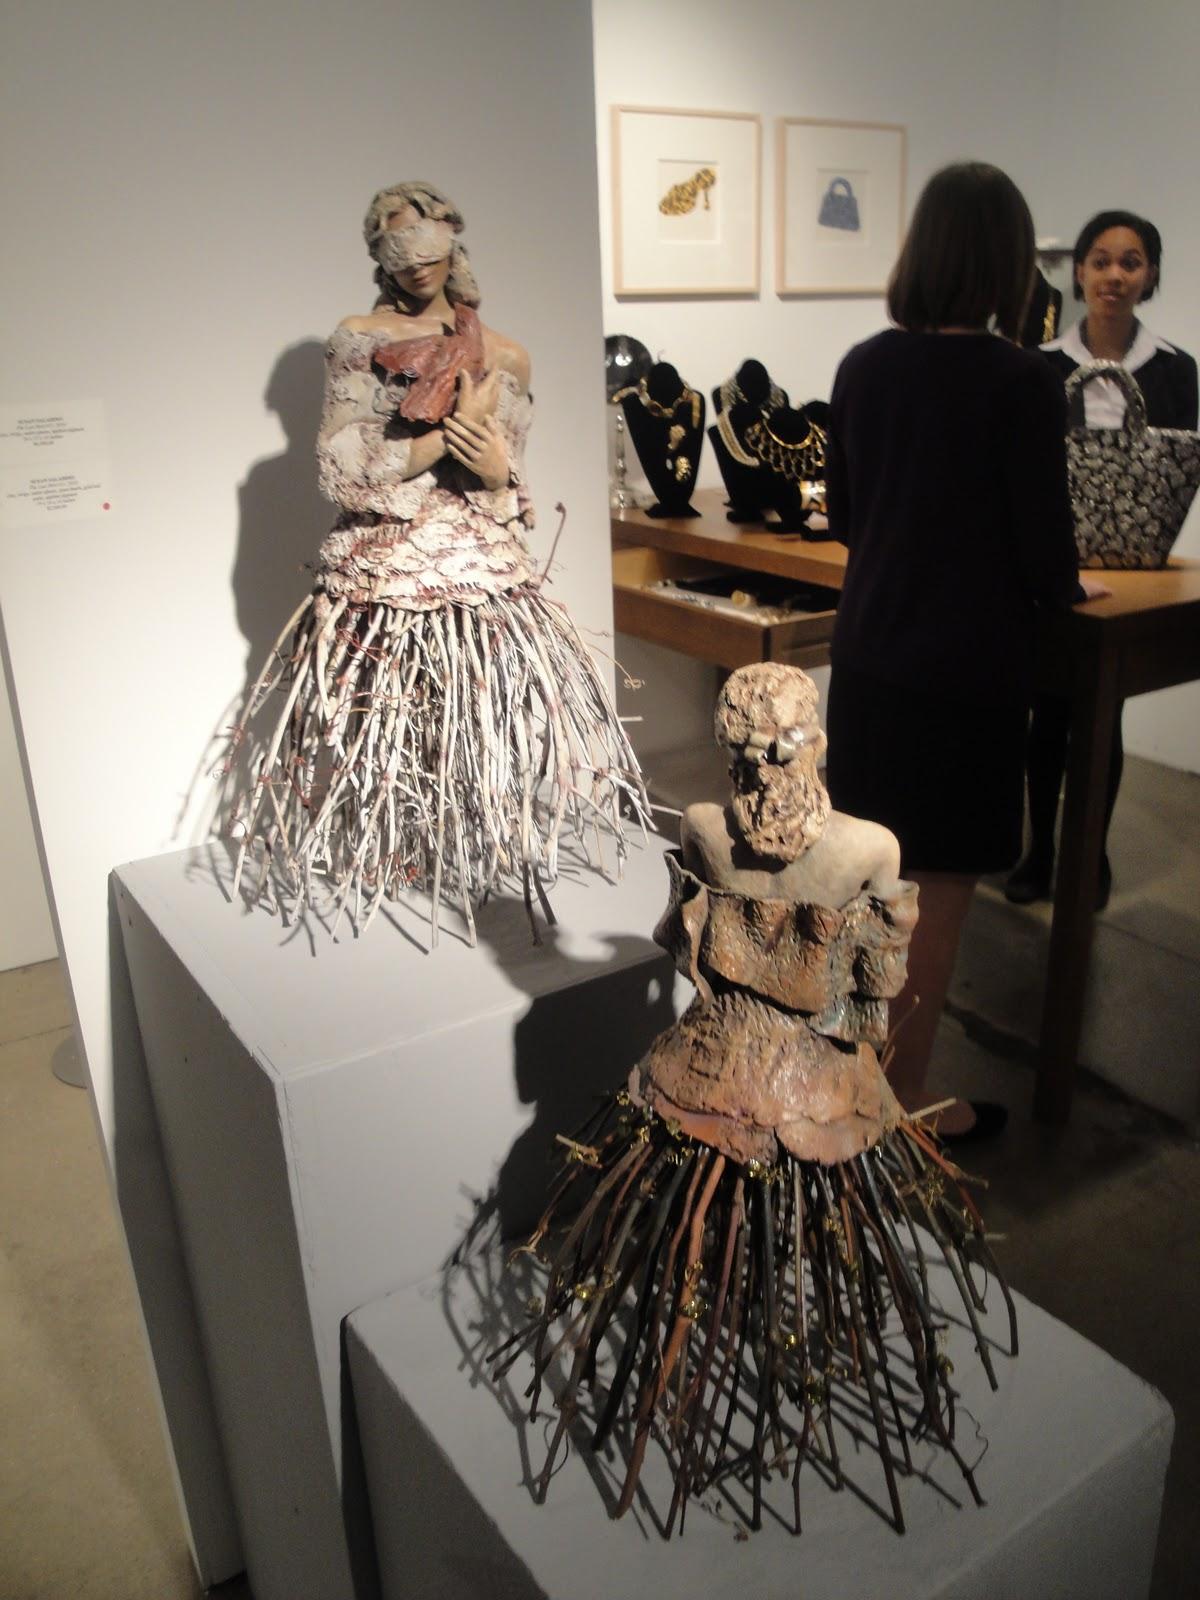 susansaladino.com expo sculpture